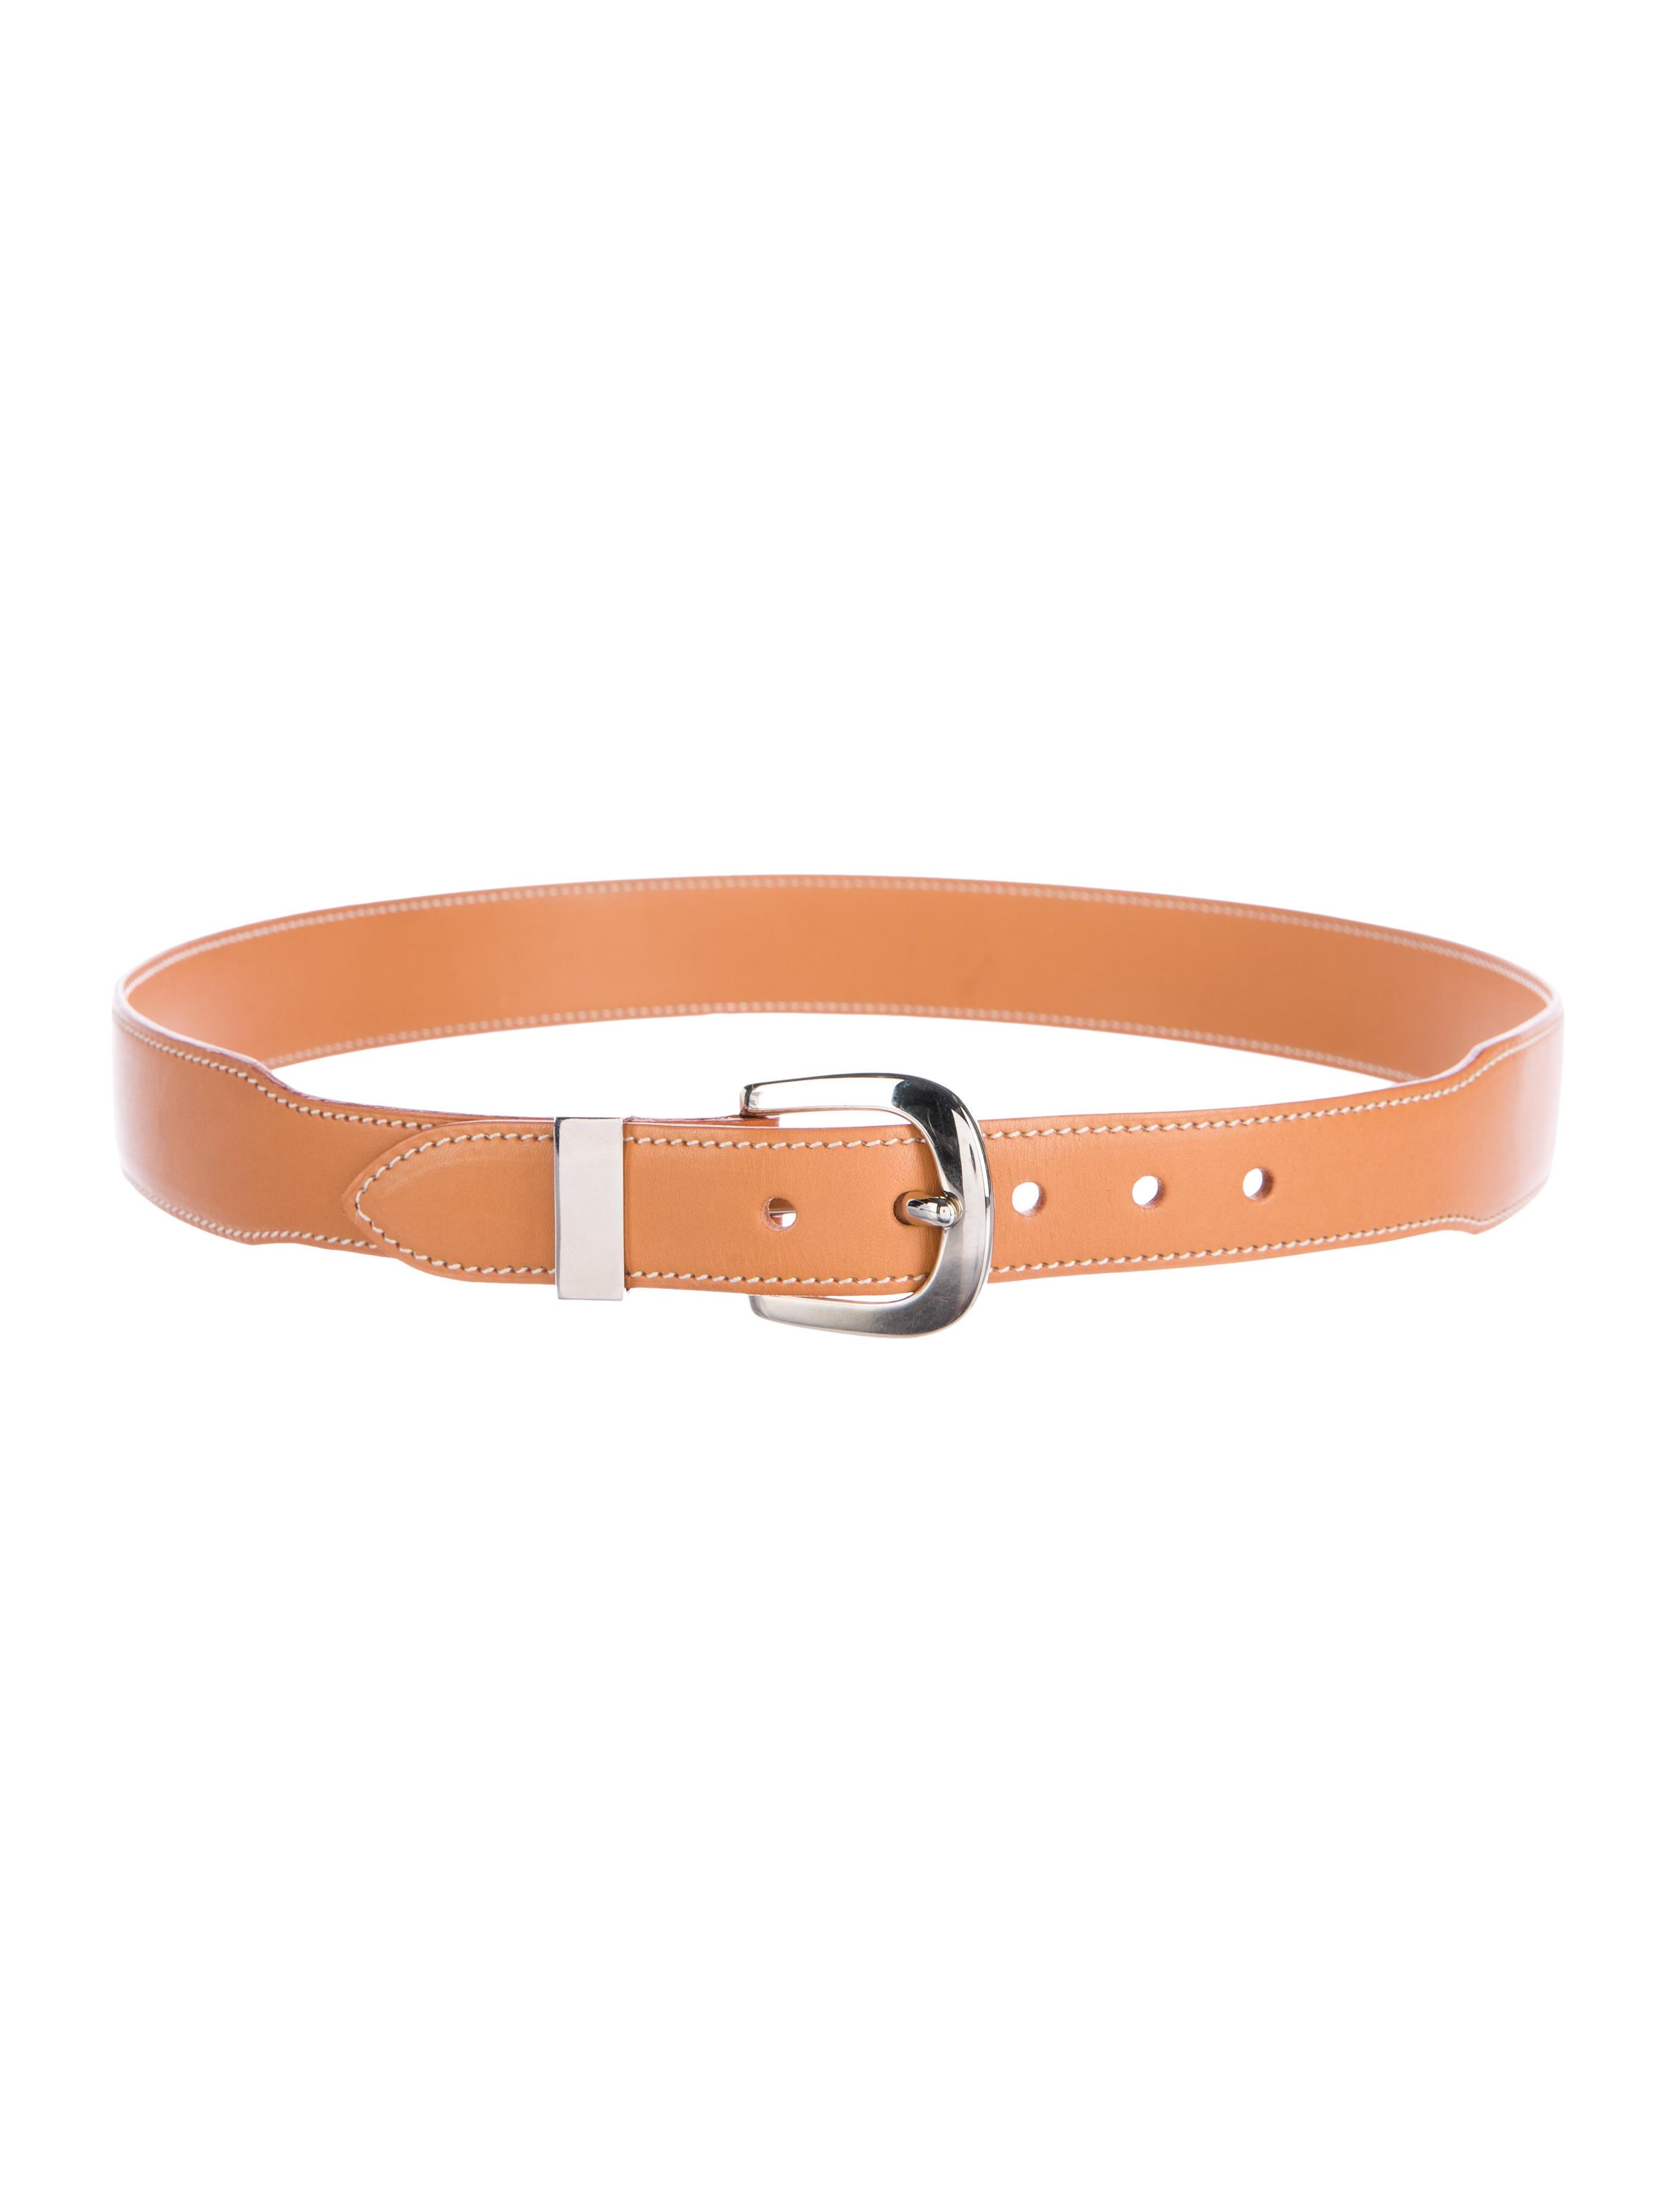 herm 232 s chamonix leather belt accessories her99421